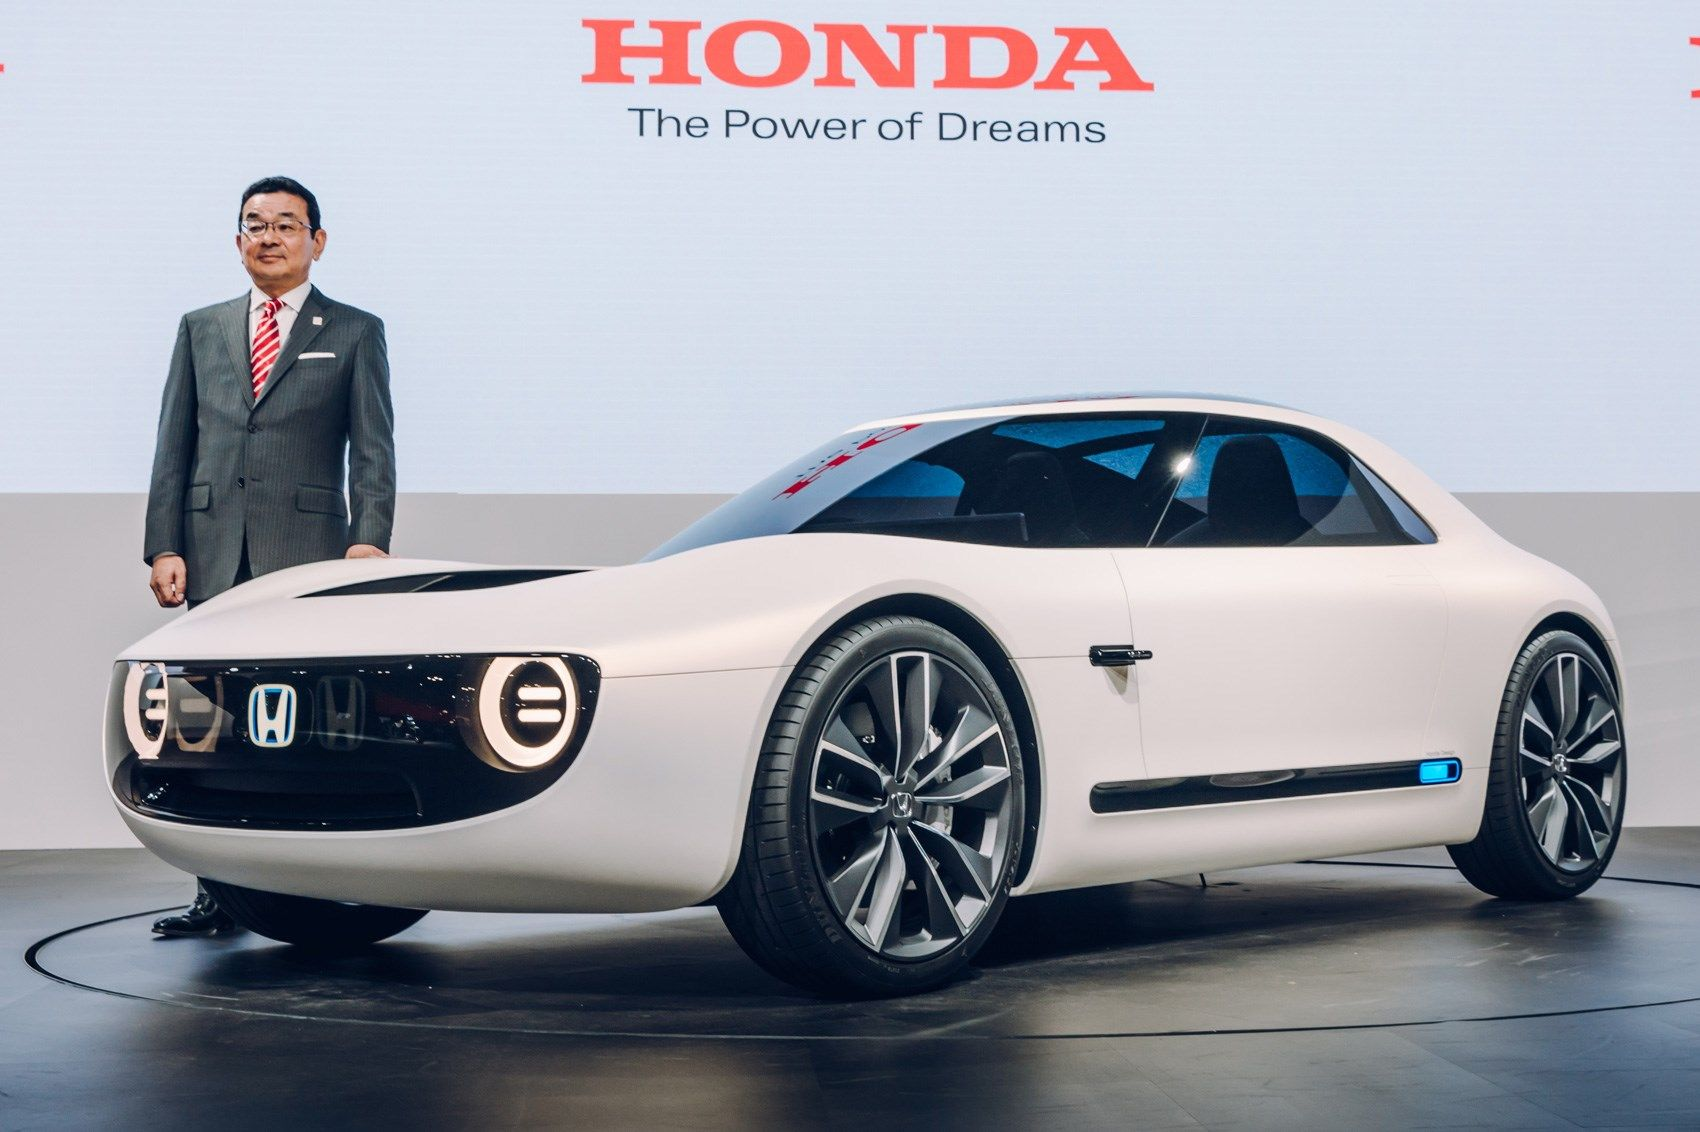 Pin By Derek Chiang On Space In 2020 Honda Electric Car Electric Cars Honda